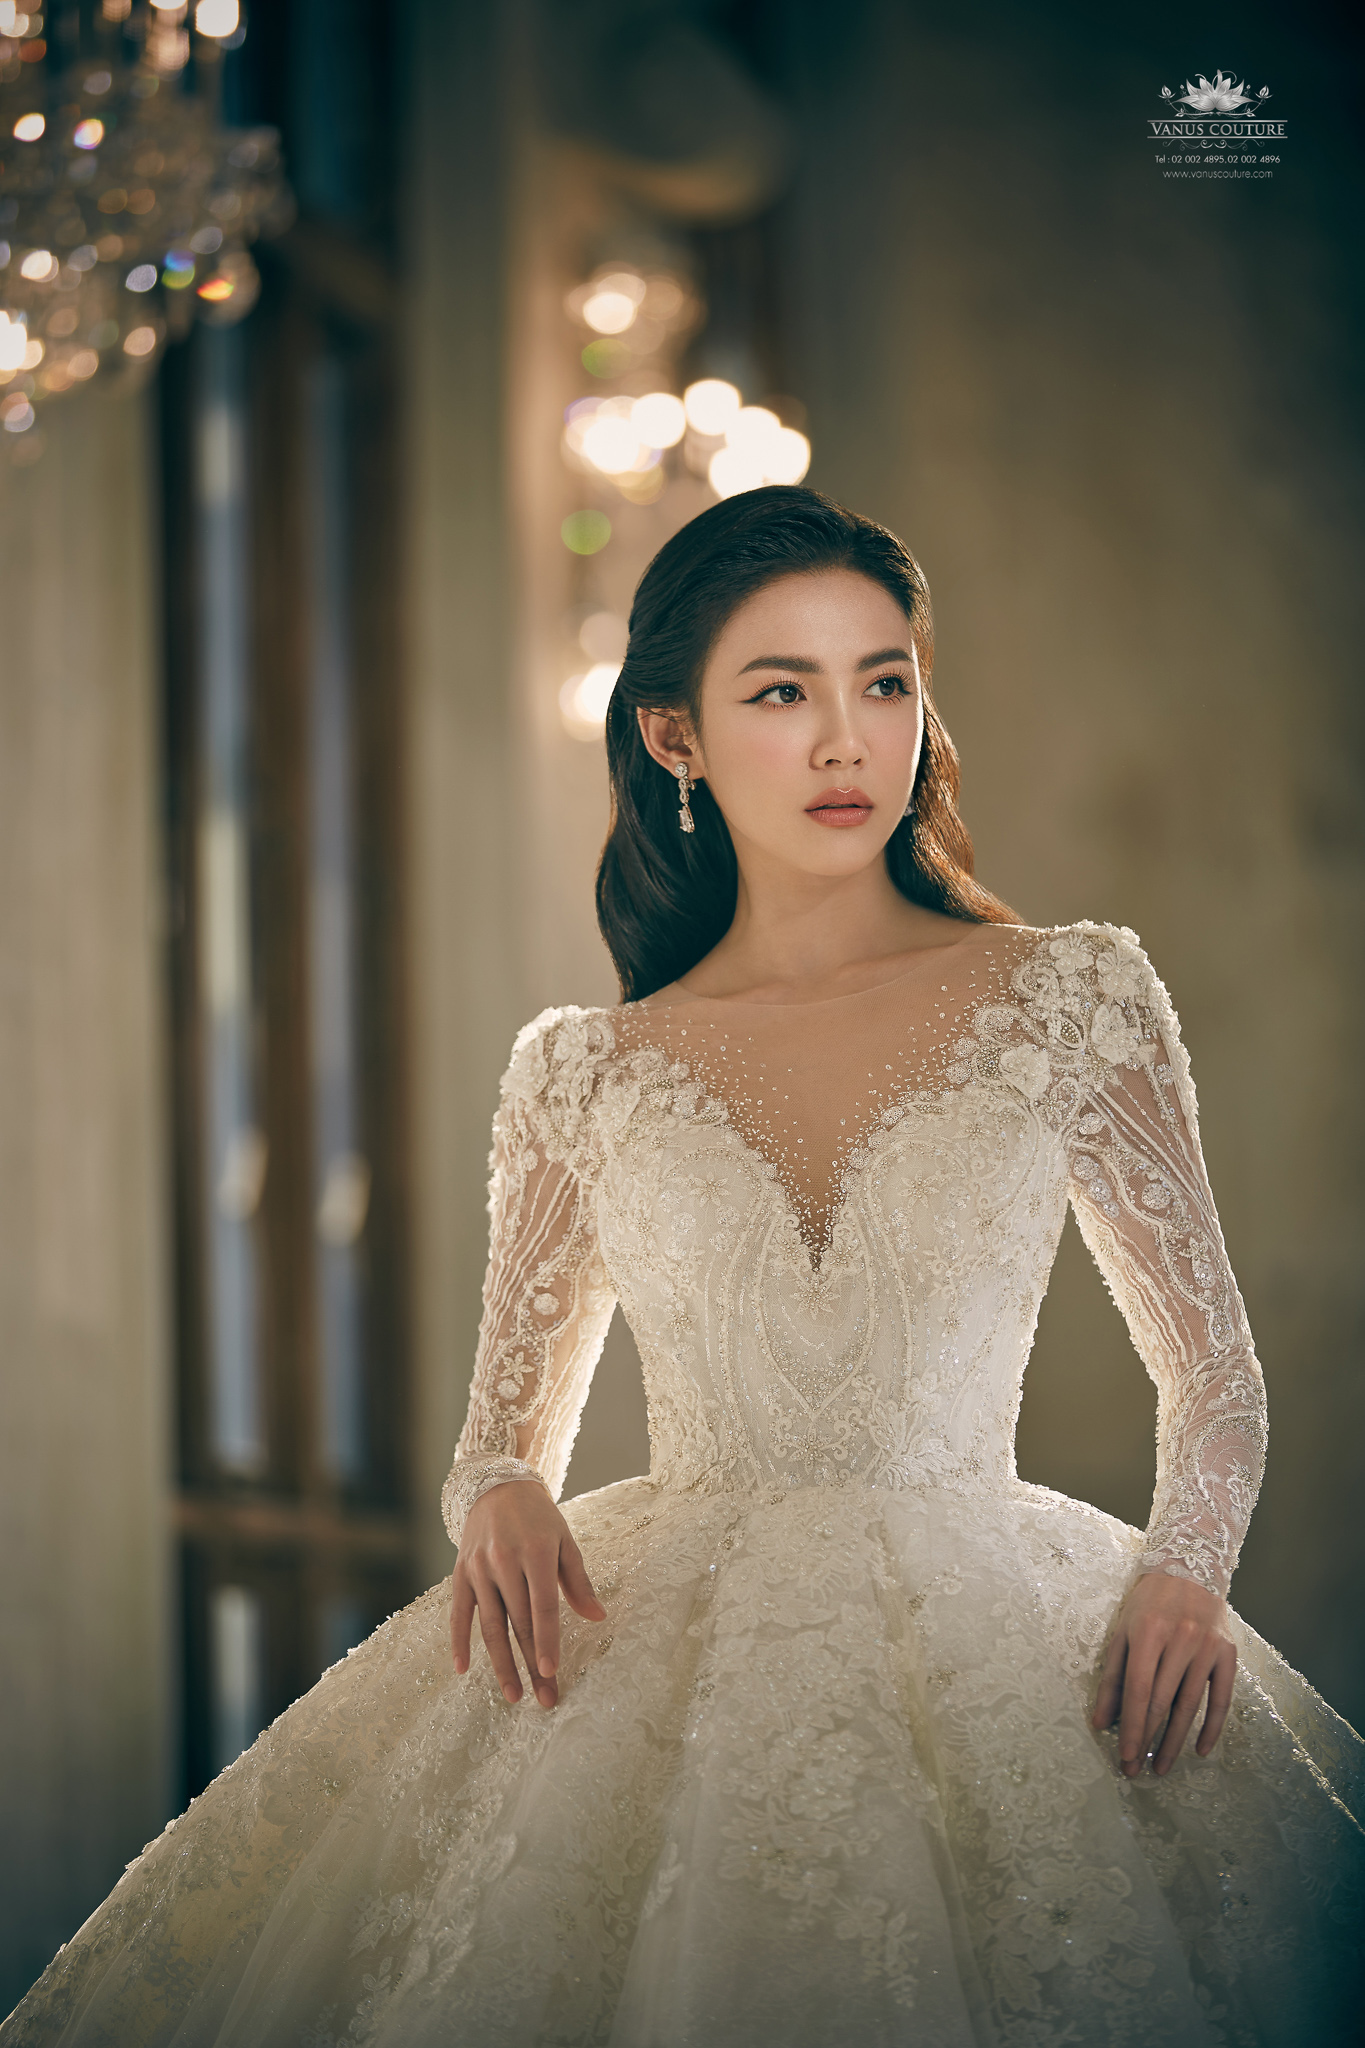 Superball wedding dress - Gybzy 04